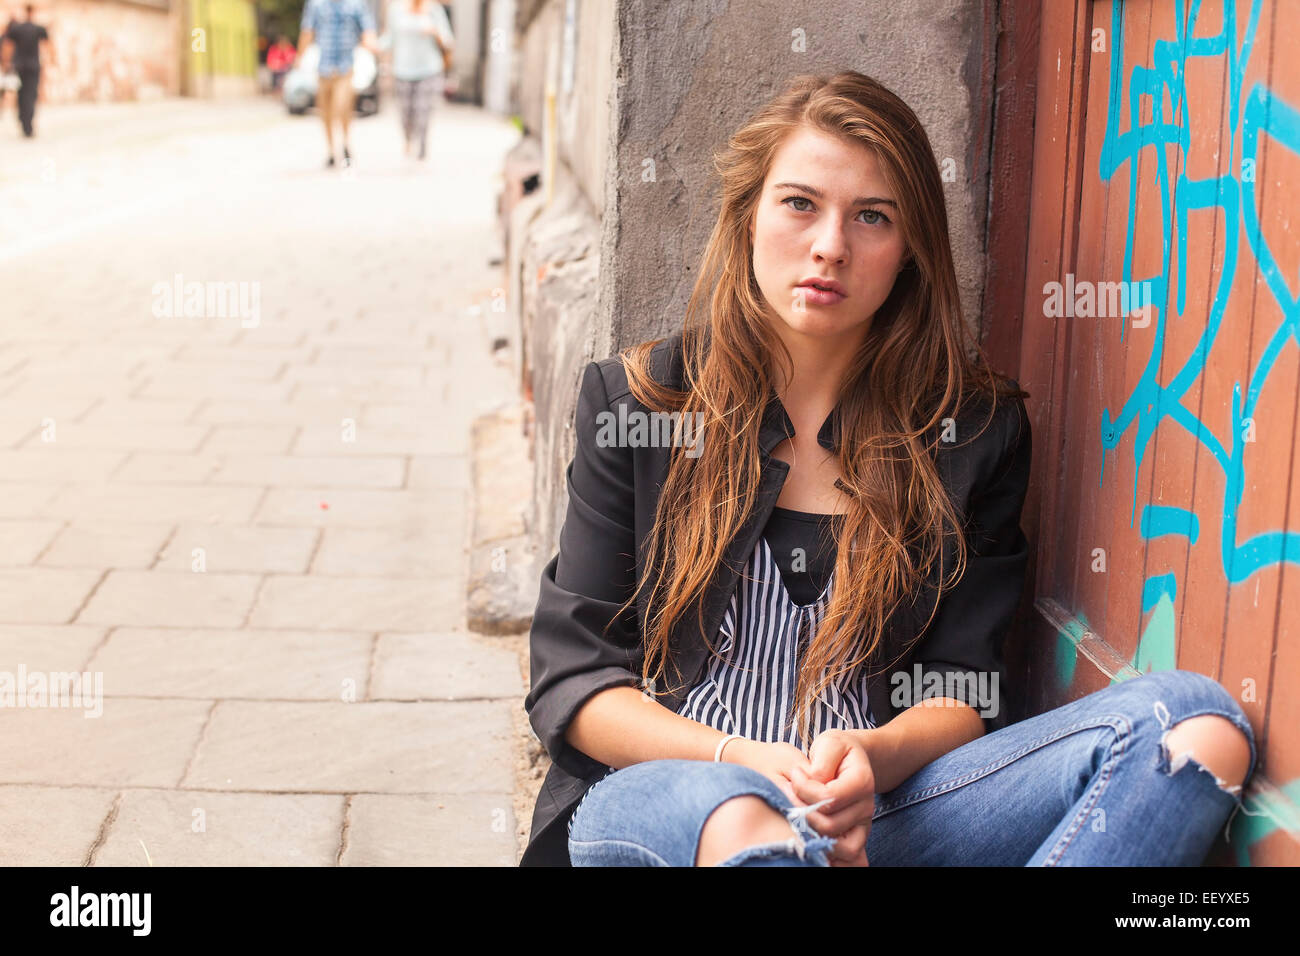 Tanga giovane ragazza seduta sulla strada. Foto Stock